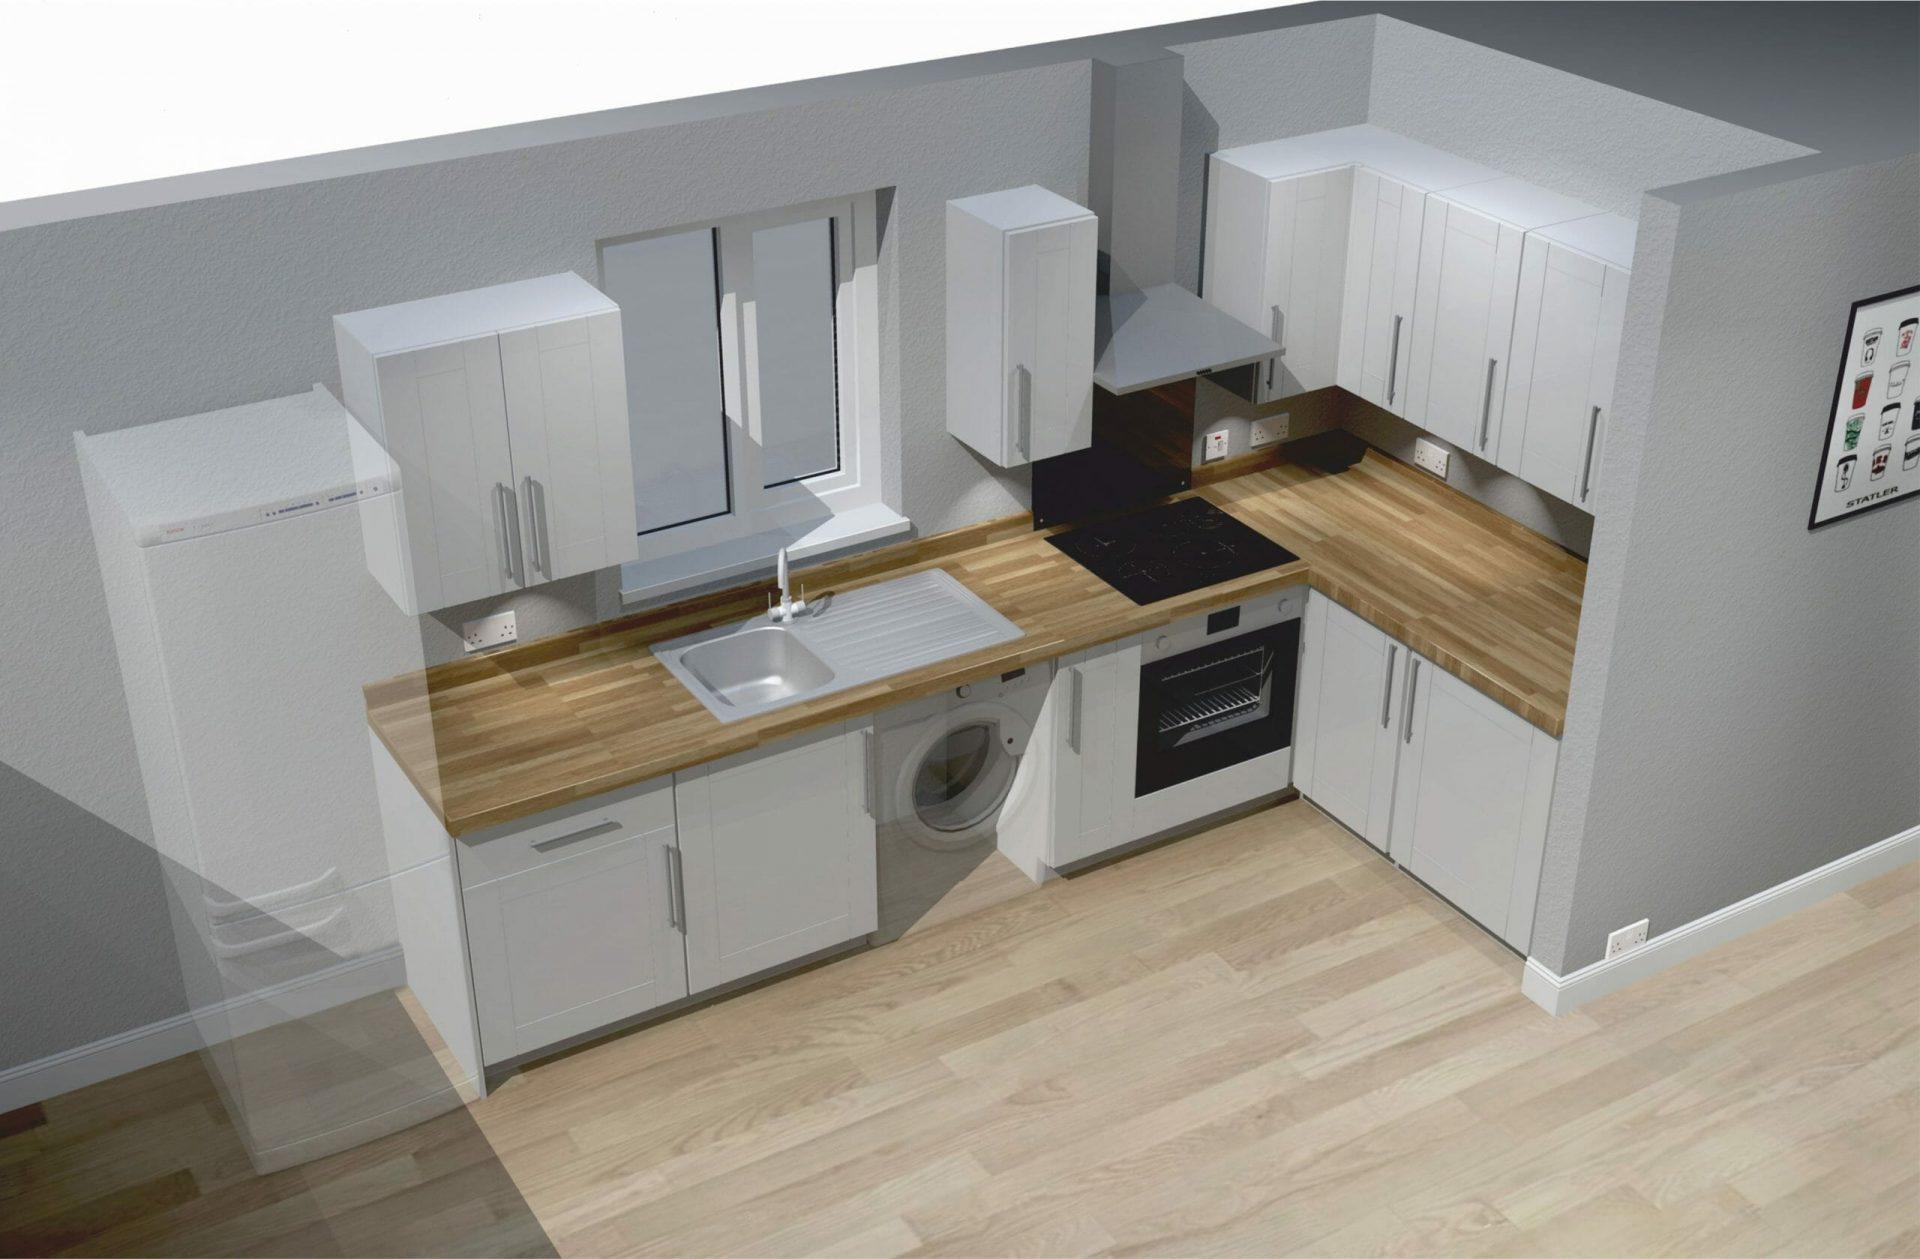 kitchen-hotspot-scaled.jpg